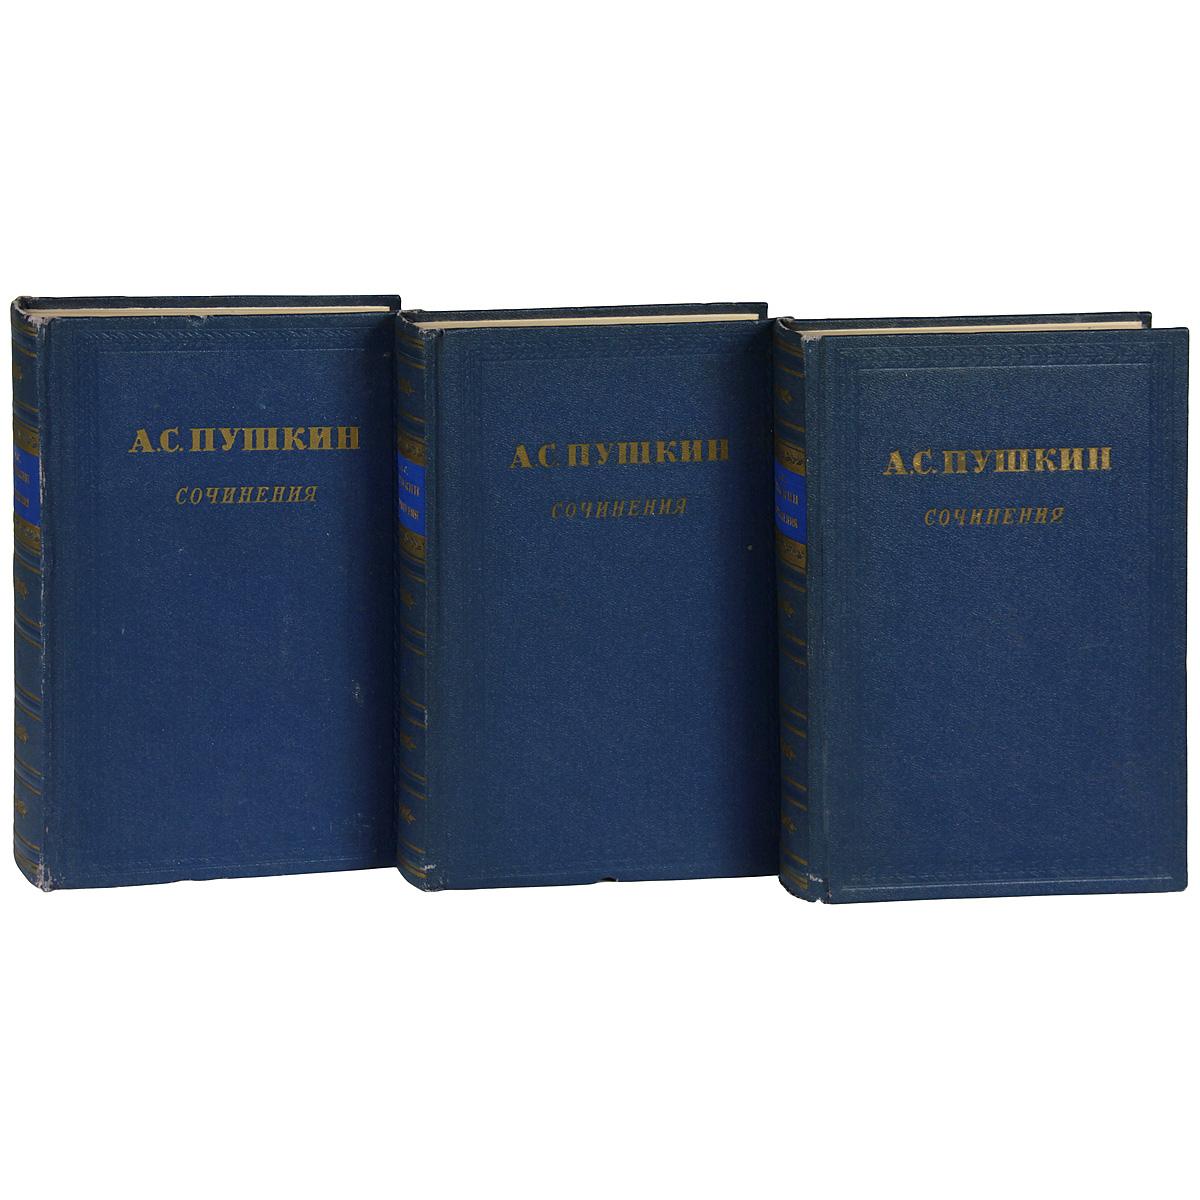 А. С. Пушкин. Сочинения (комплект из 3 книг)